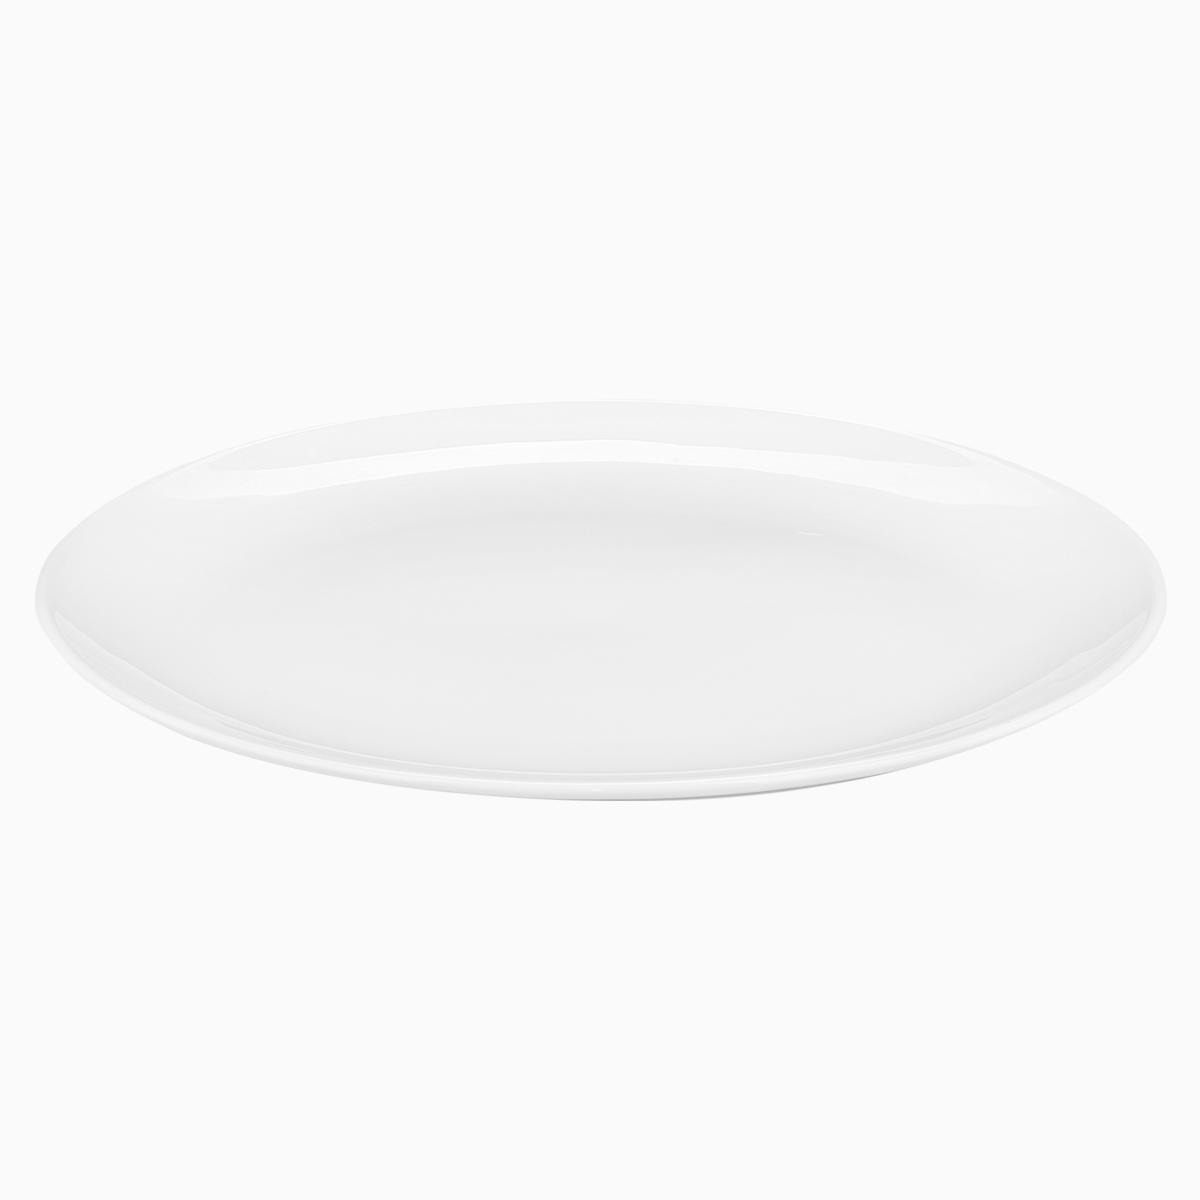 Plate Oval